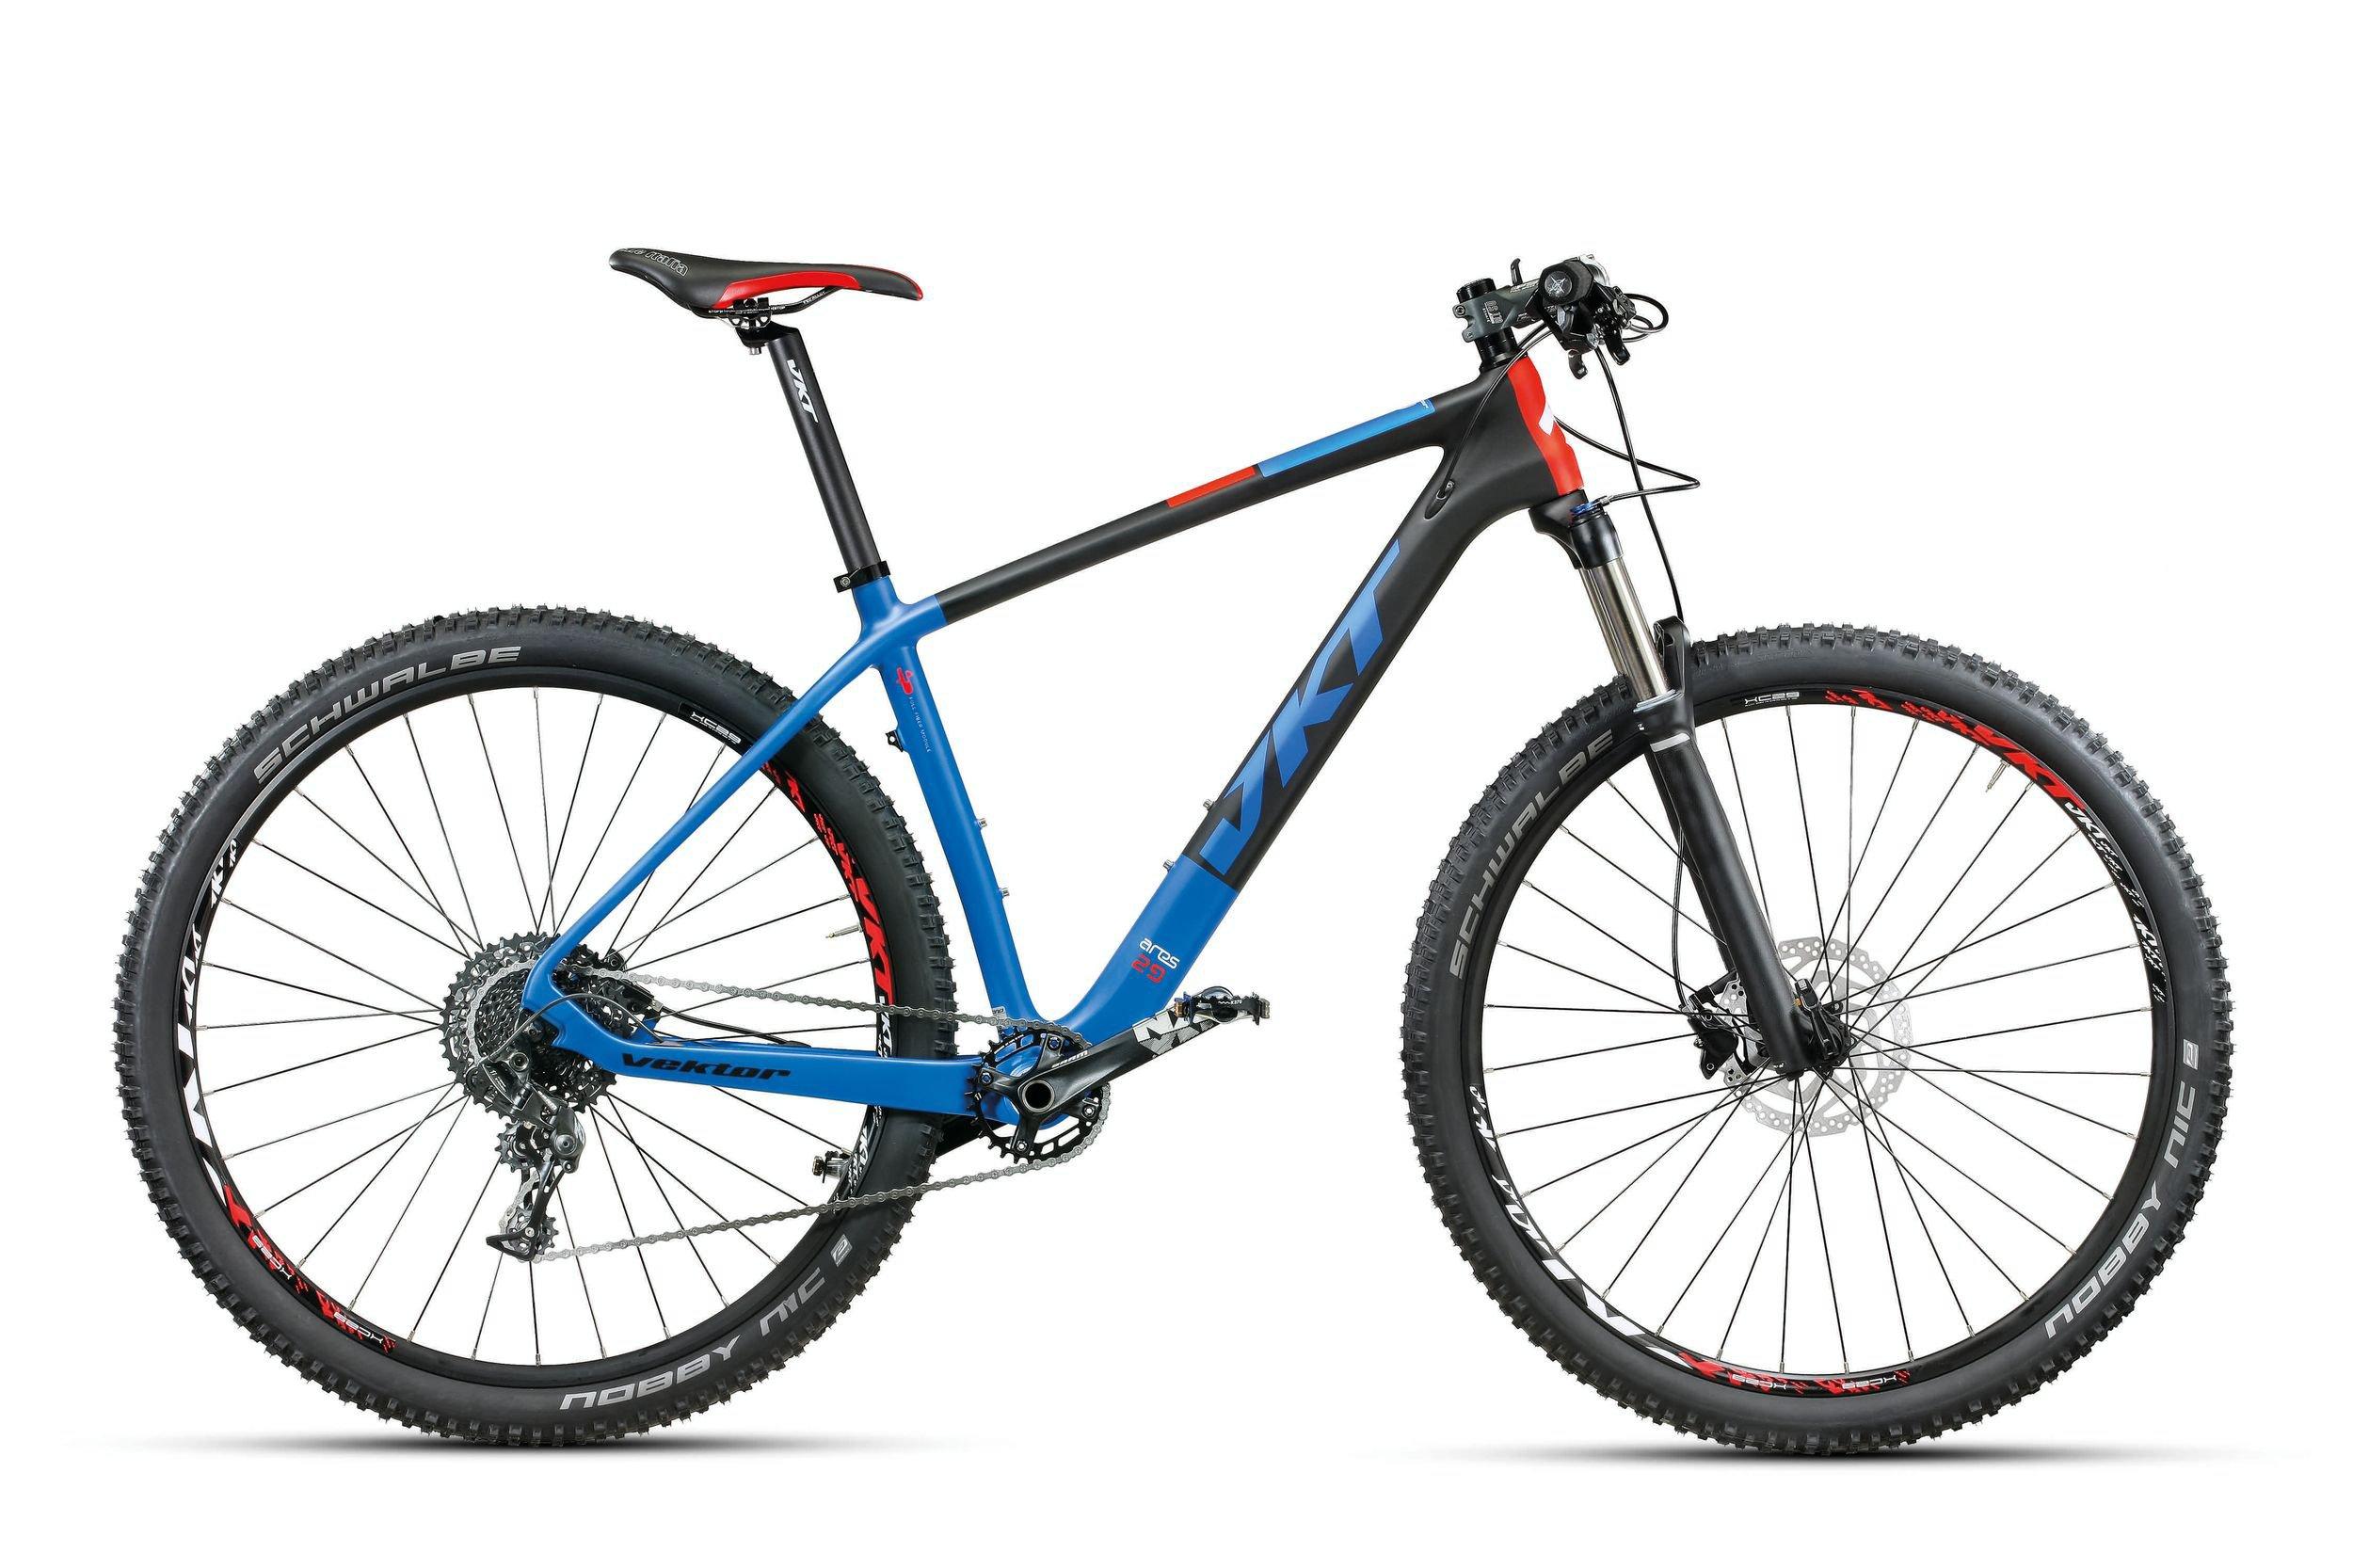 Vektor Ares Carbon 29 11 speed SRAM NX, blå/sort/rød